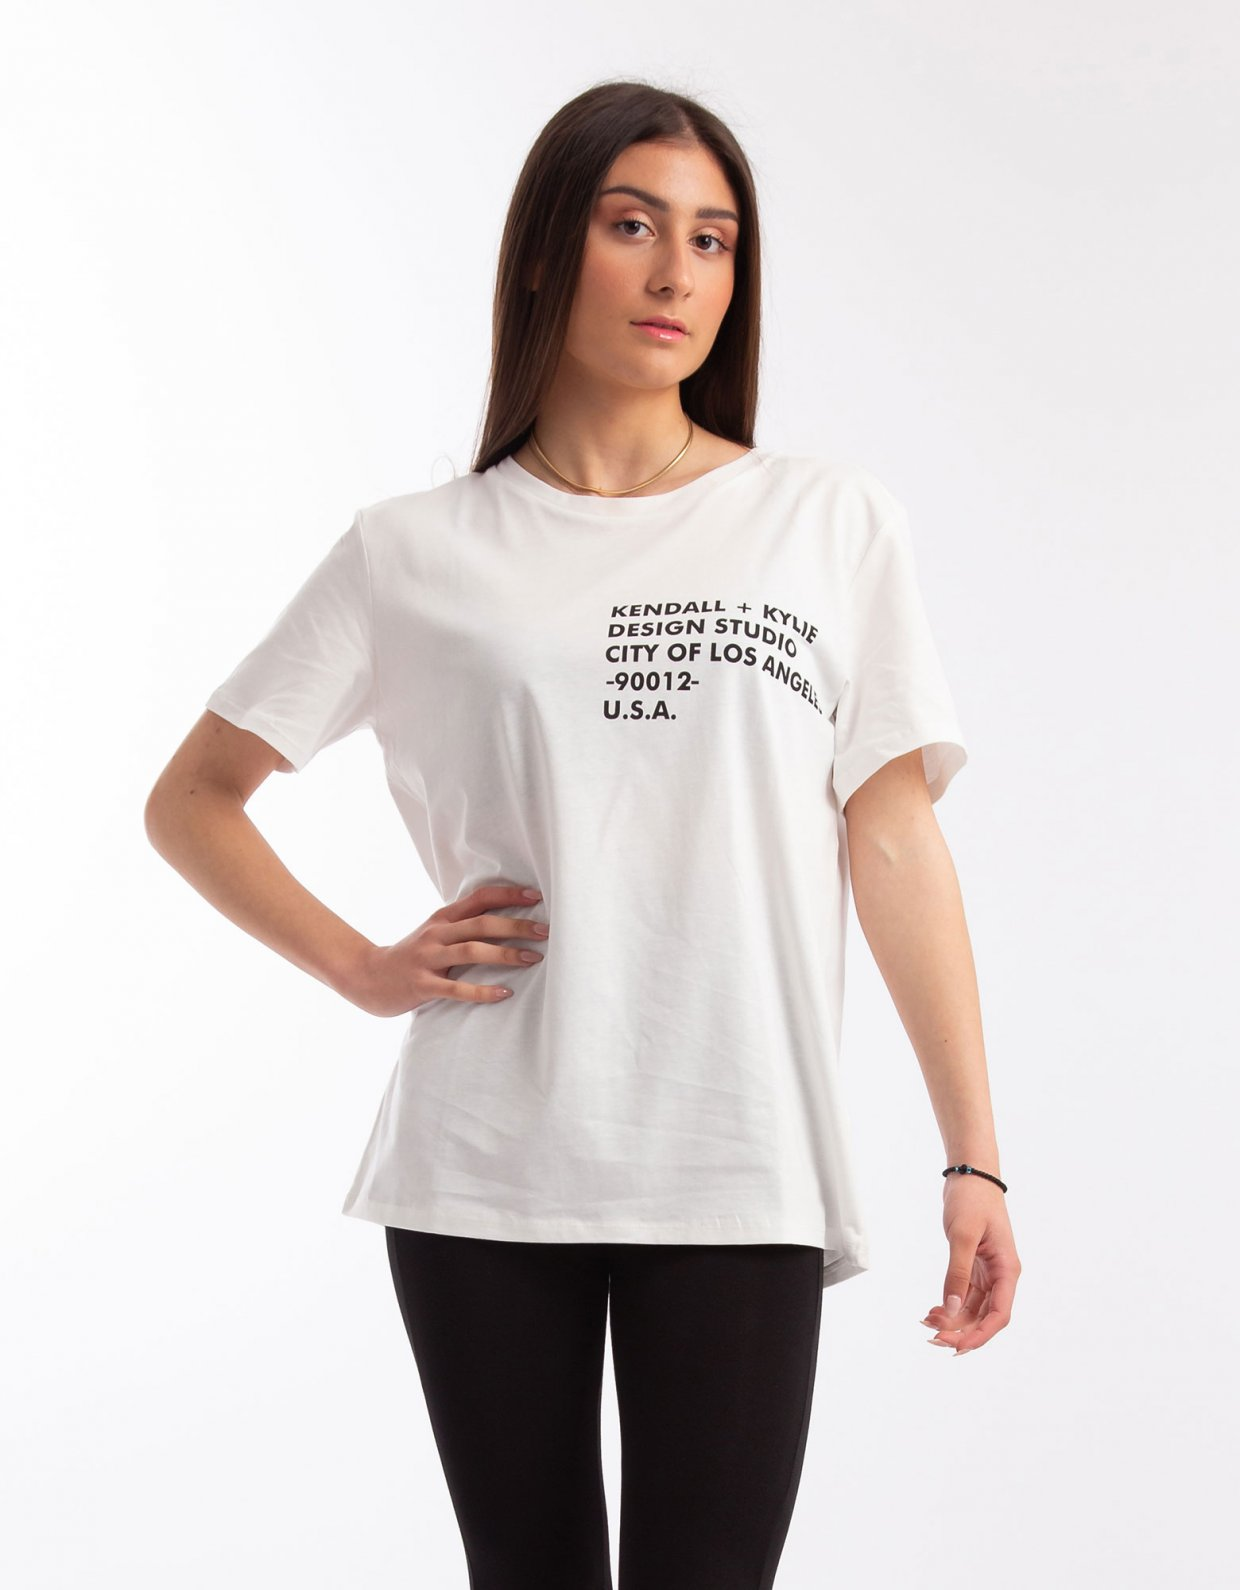 Kendall + Kylie Longfit logo t-shirt white